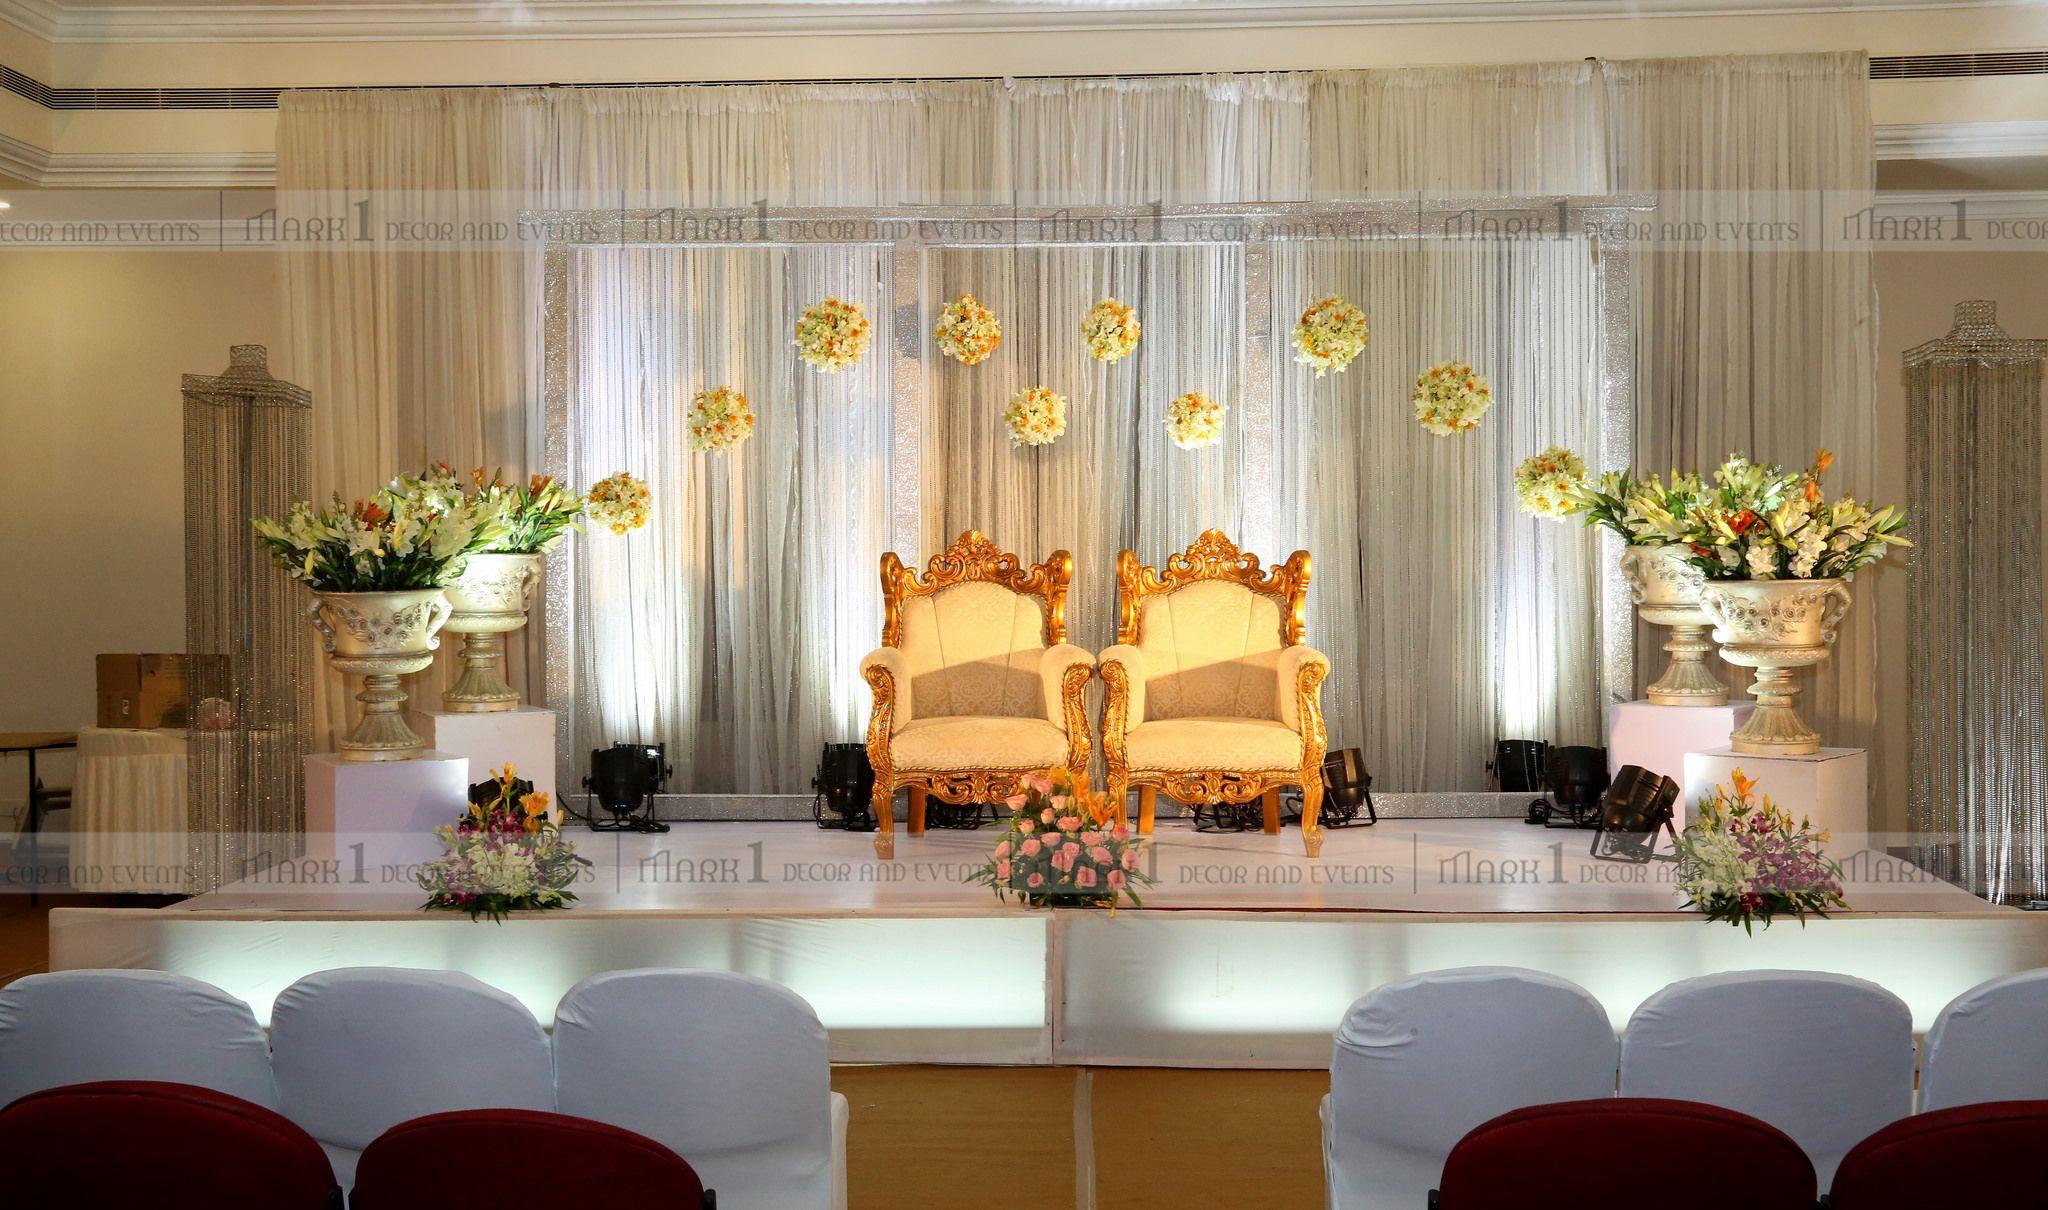 Decors  Wedding Stage Decorators In Coimbatore, Chennai, Bangalore, Cochin